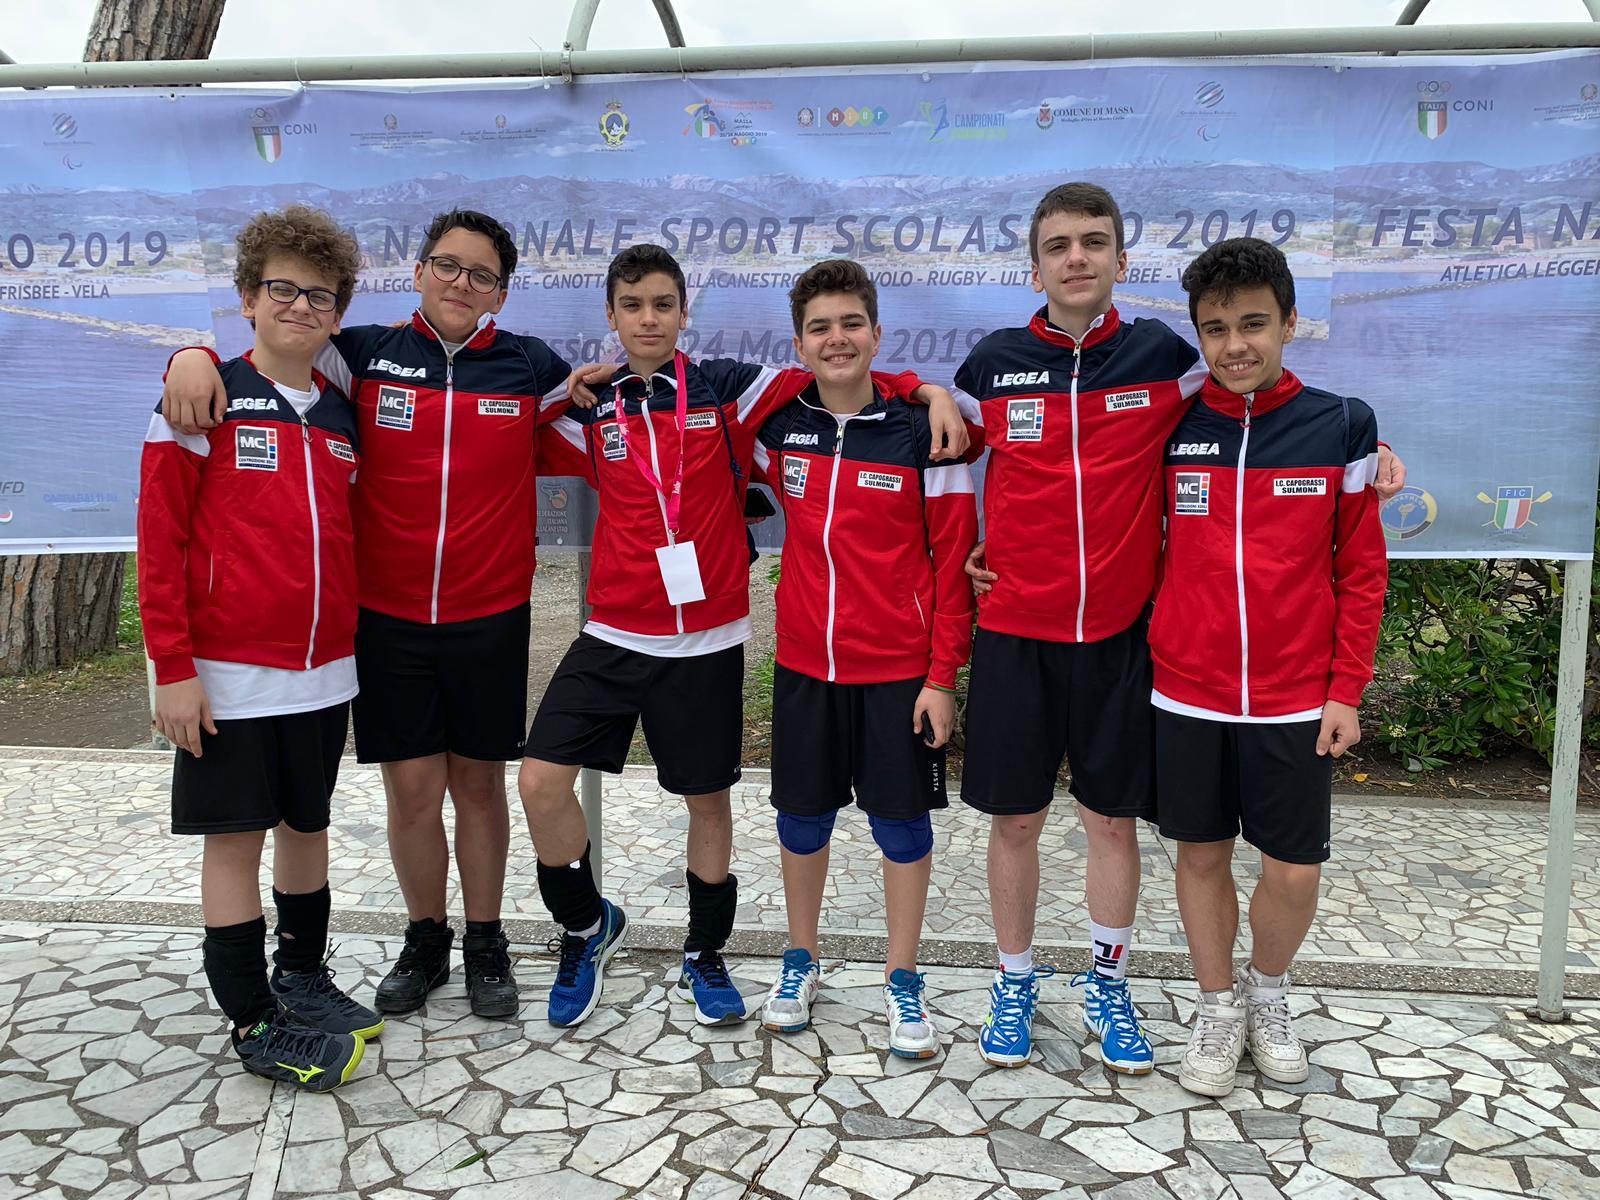 Campionati Sportivi Studenteschi 2019